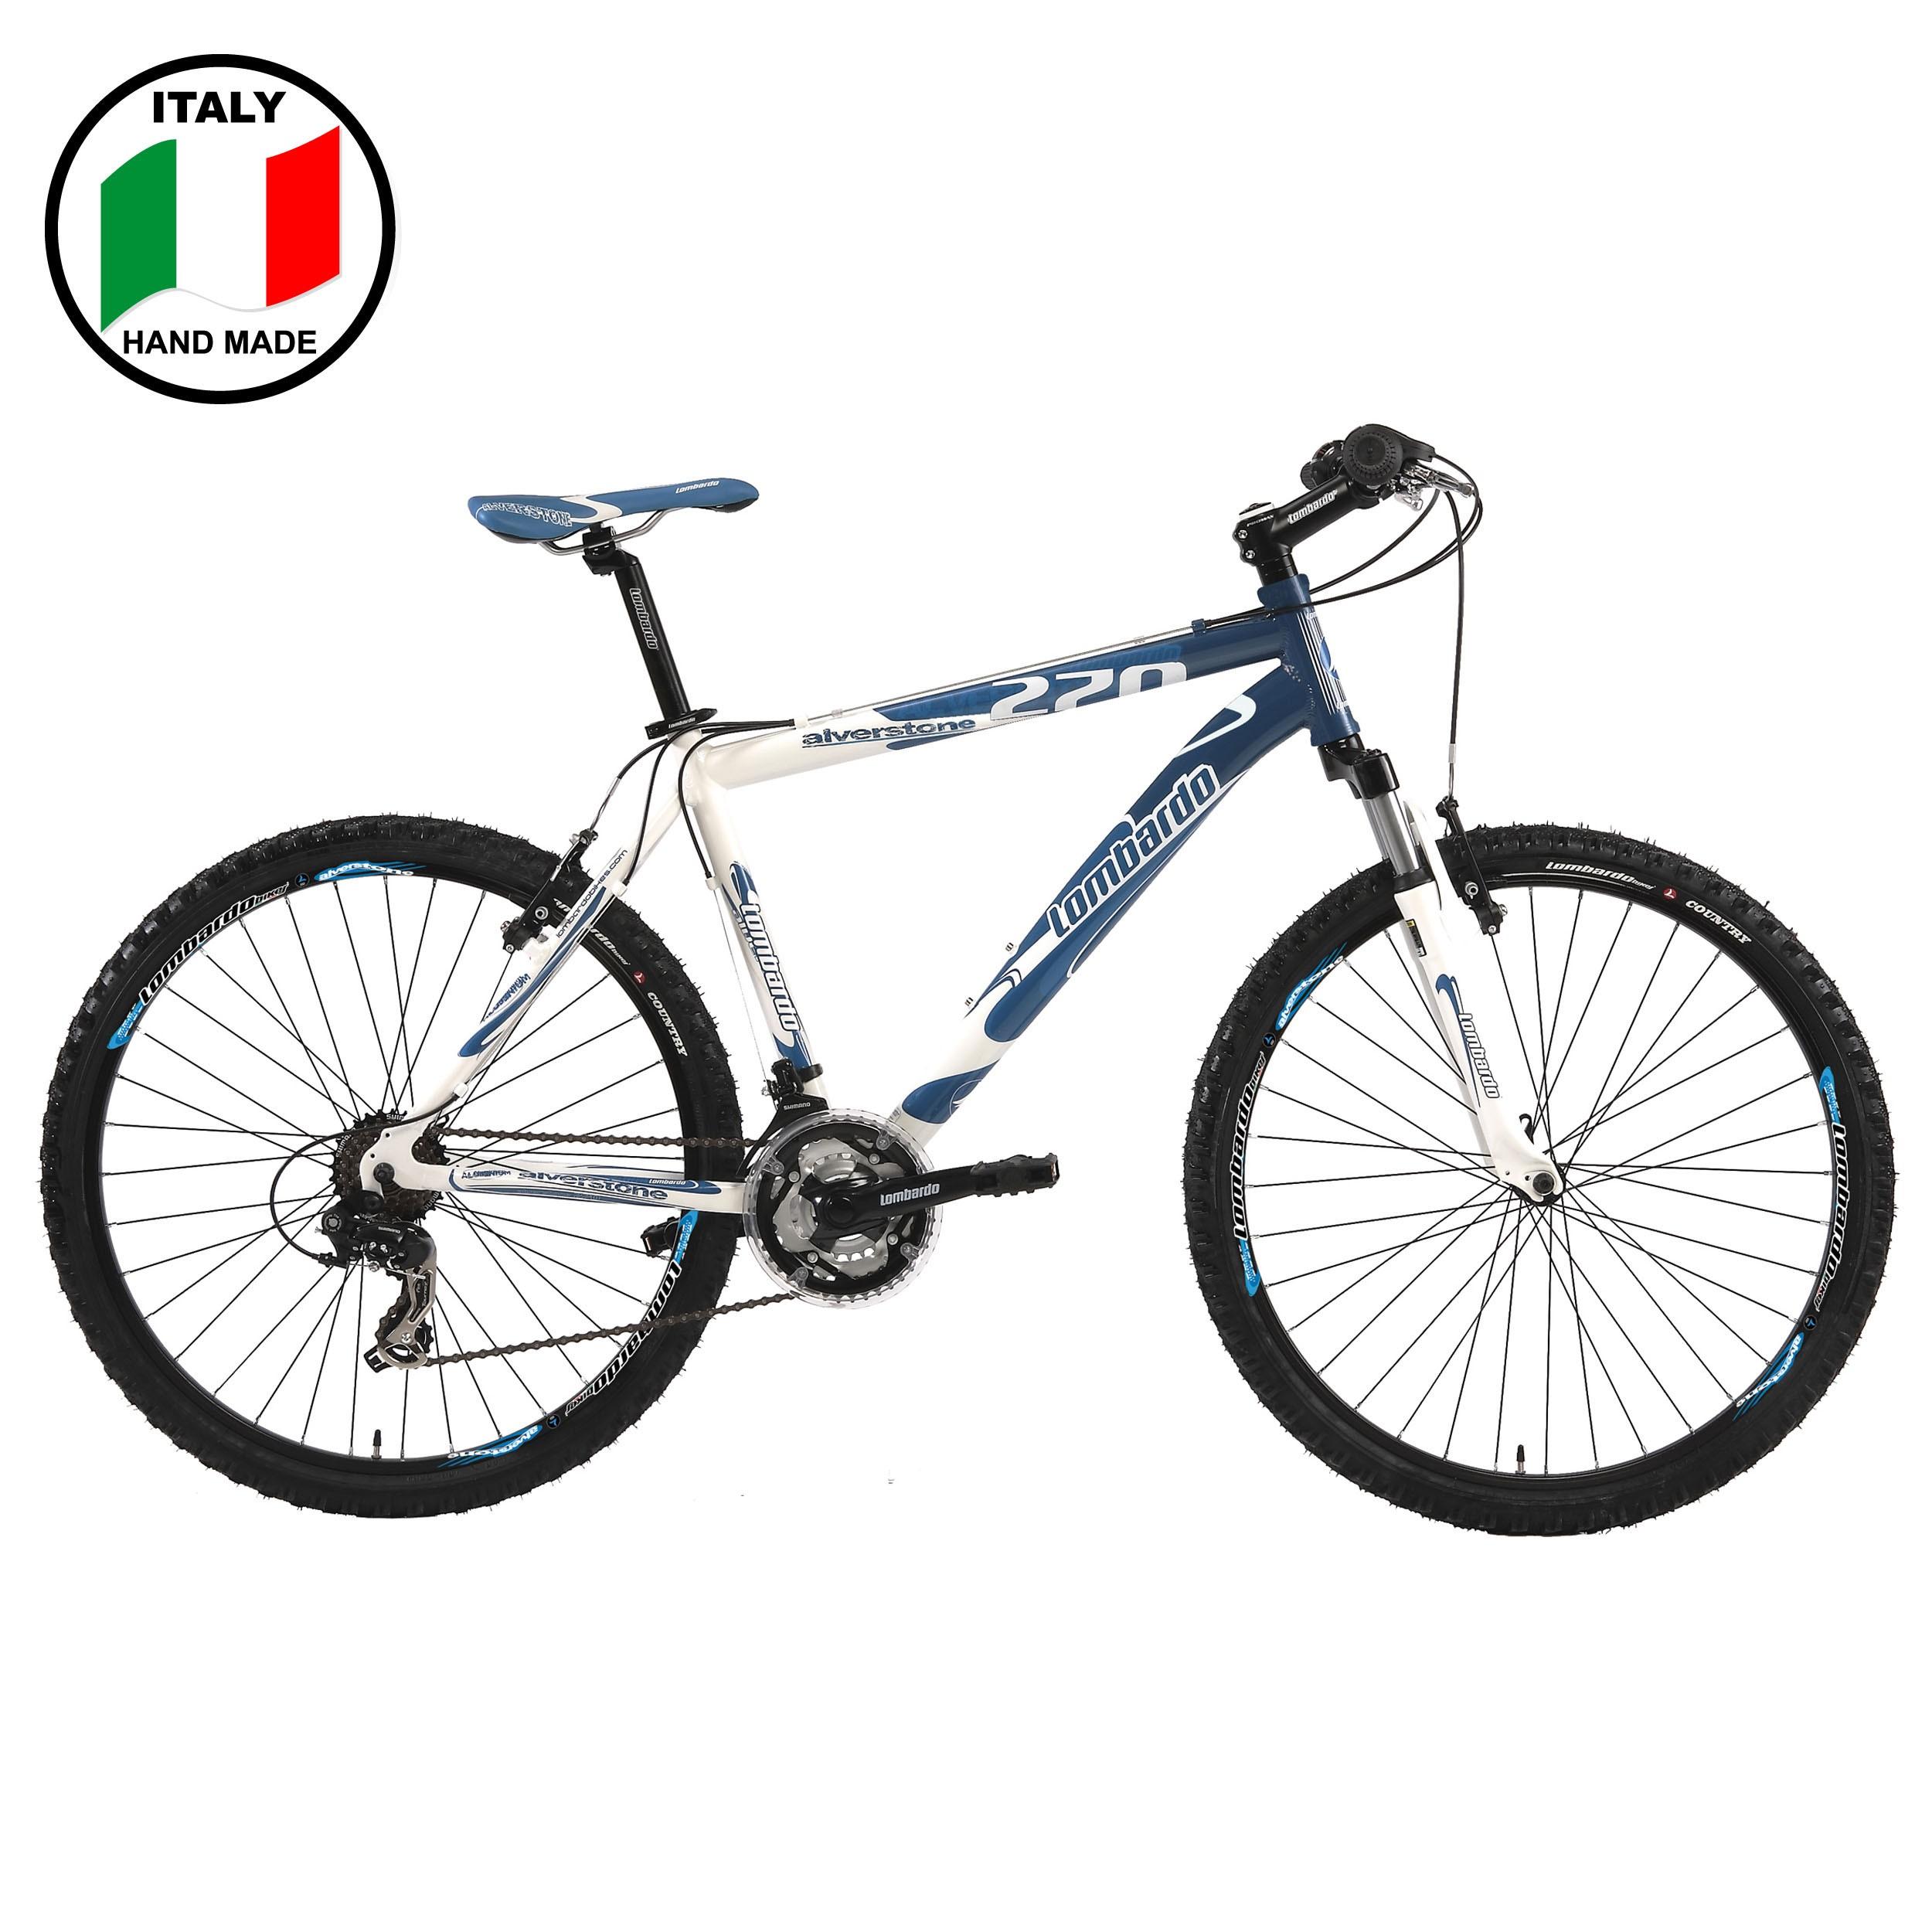 Lombardo Alverstone 270 26 inch Bike- Midnight